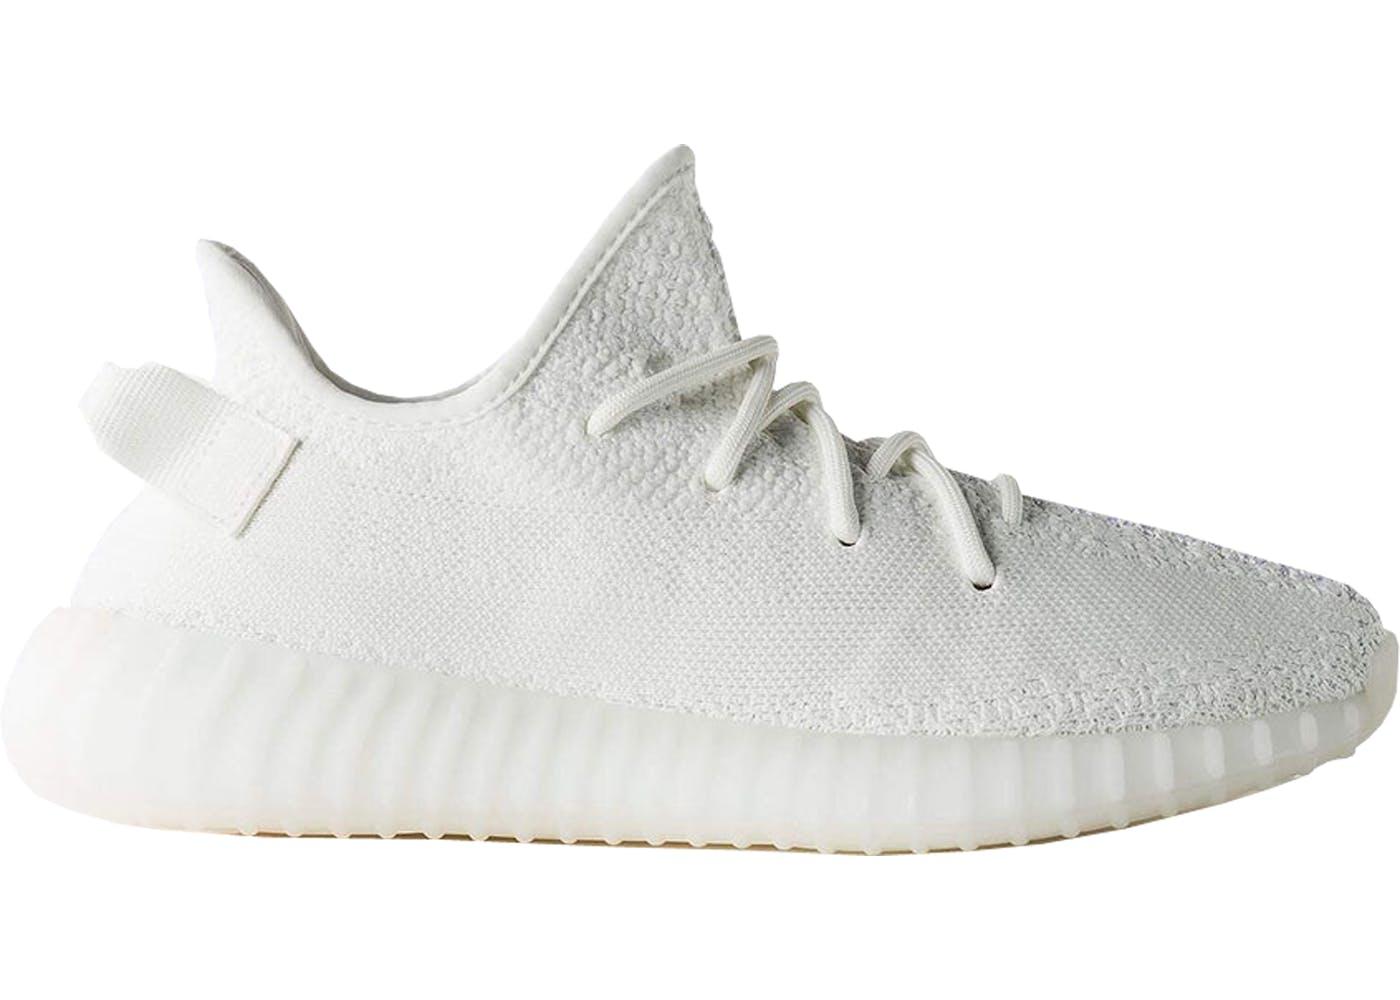 adidas yeezy boost 350 v2 crema